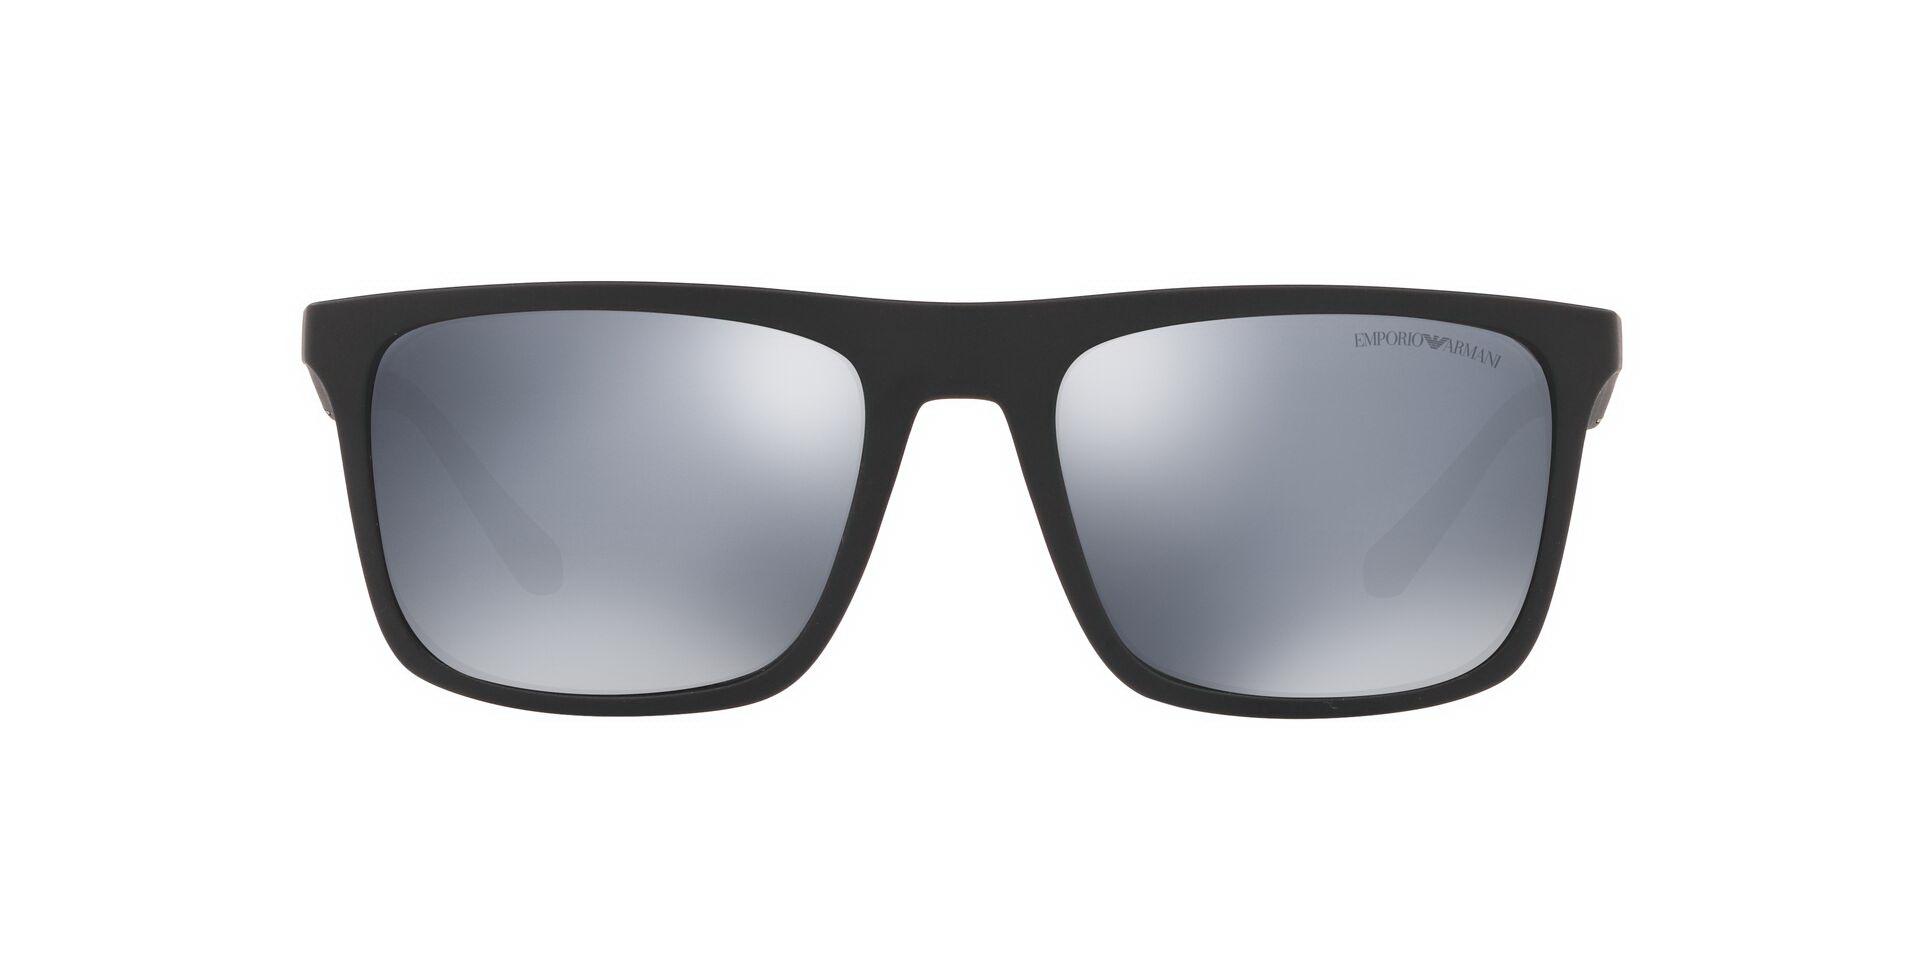 Солнцезащитные очки Очки с/з Emporio Armani 0EA4097 5017Z3